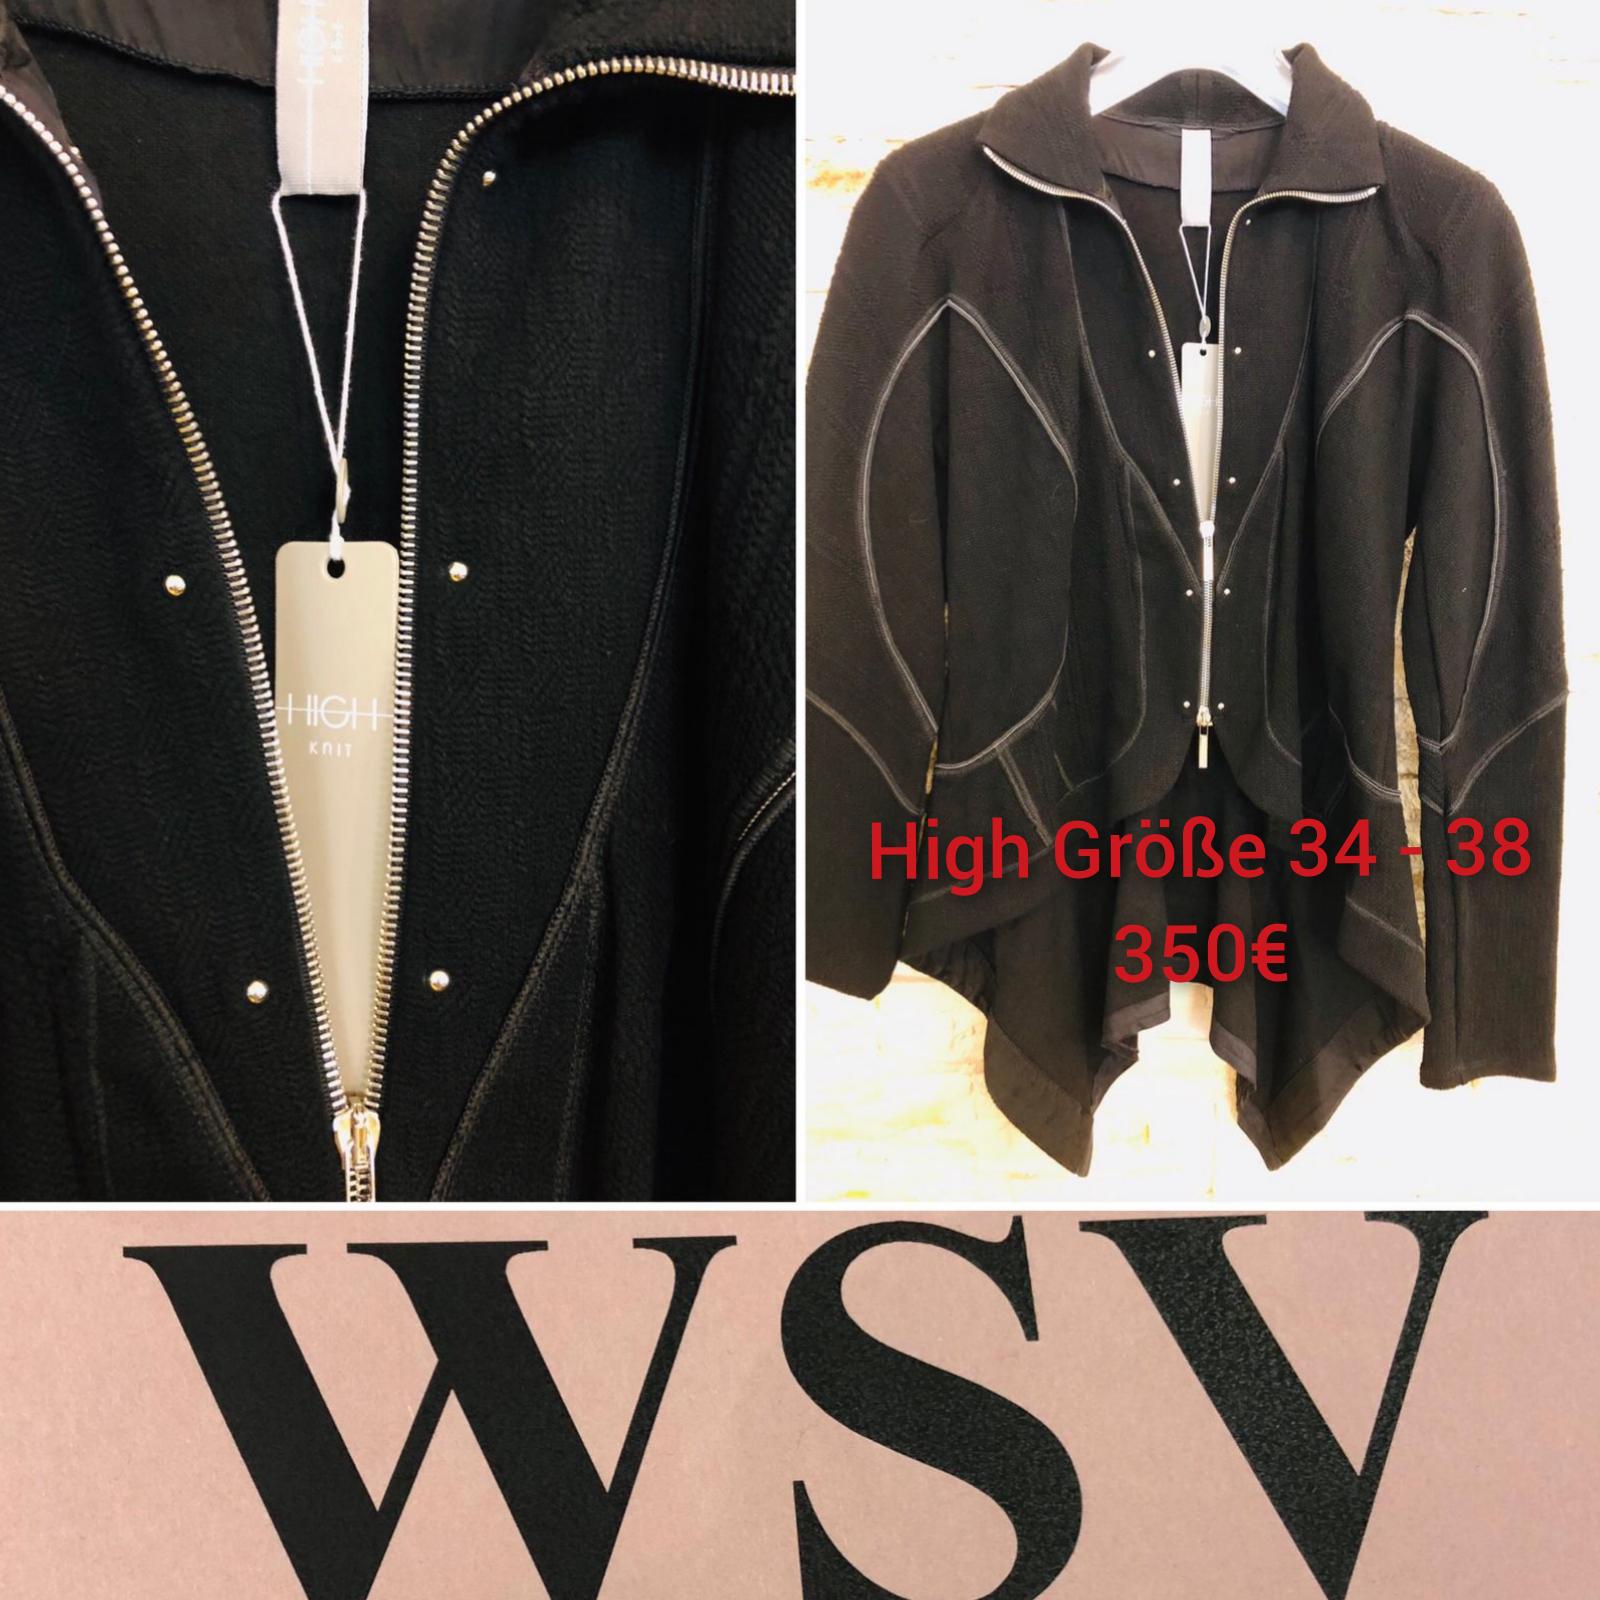 High WSV